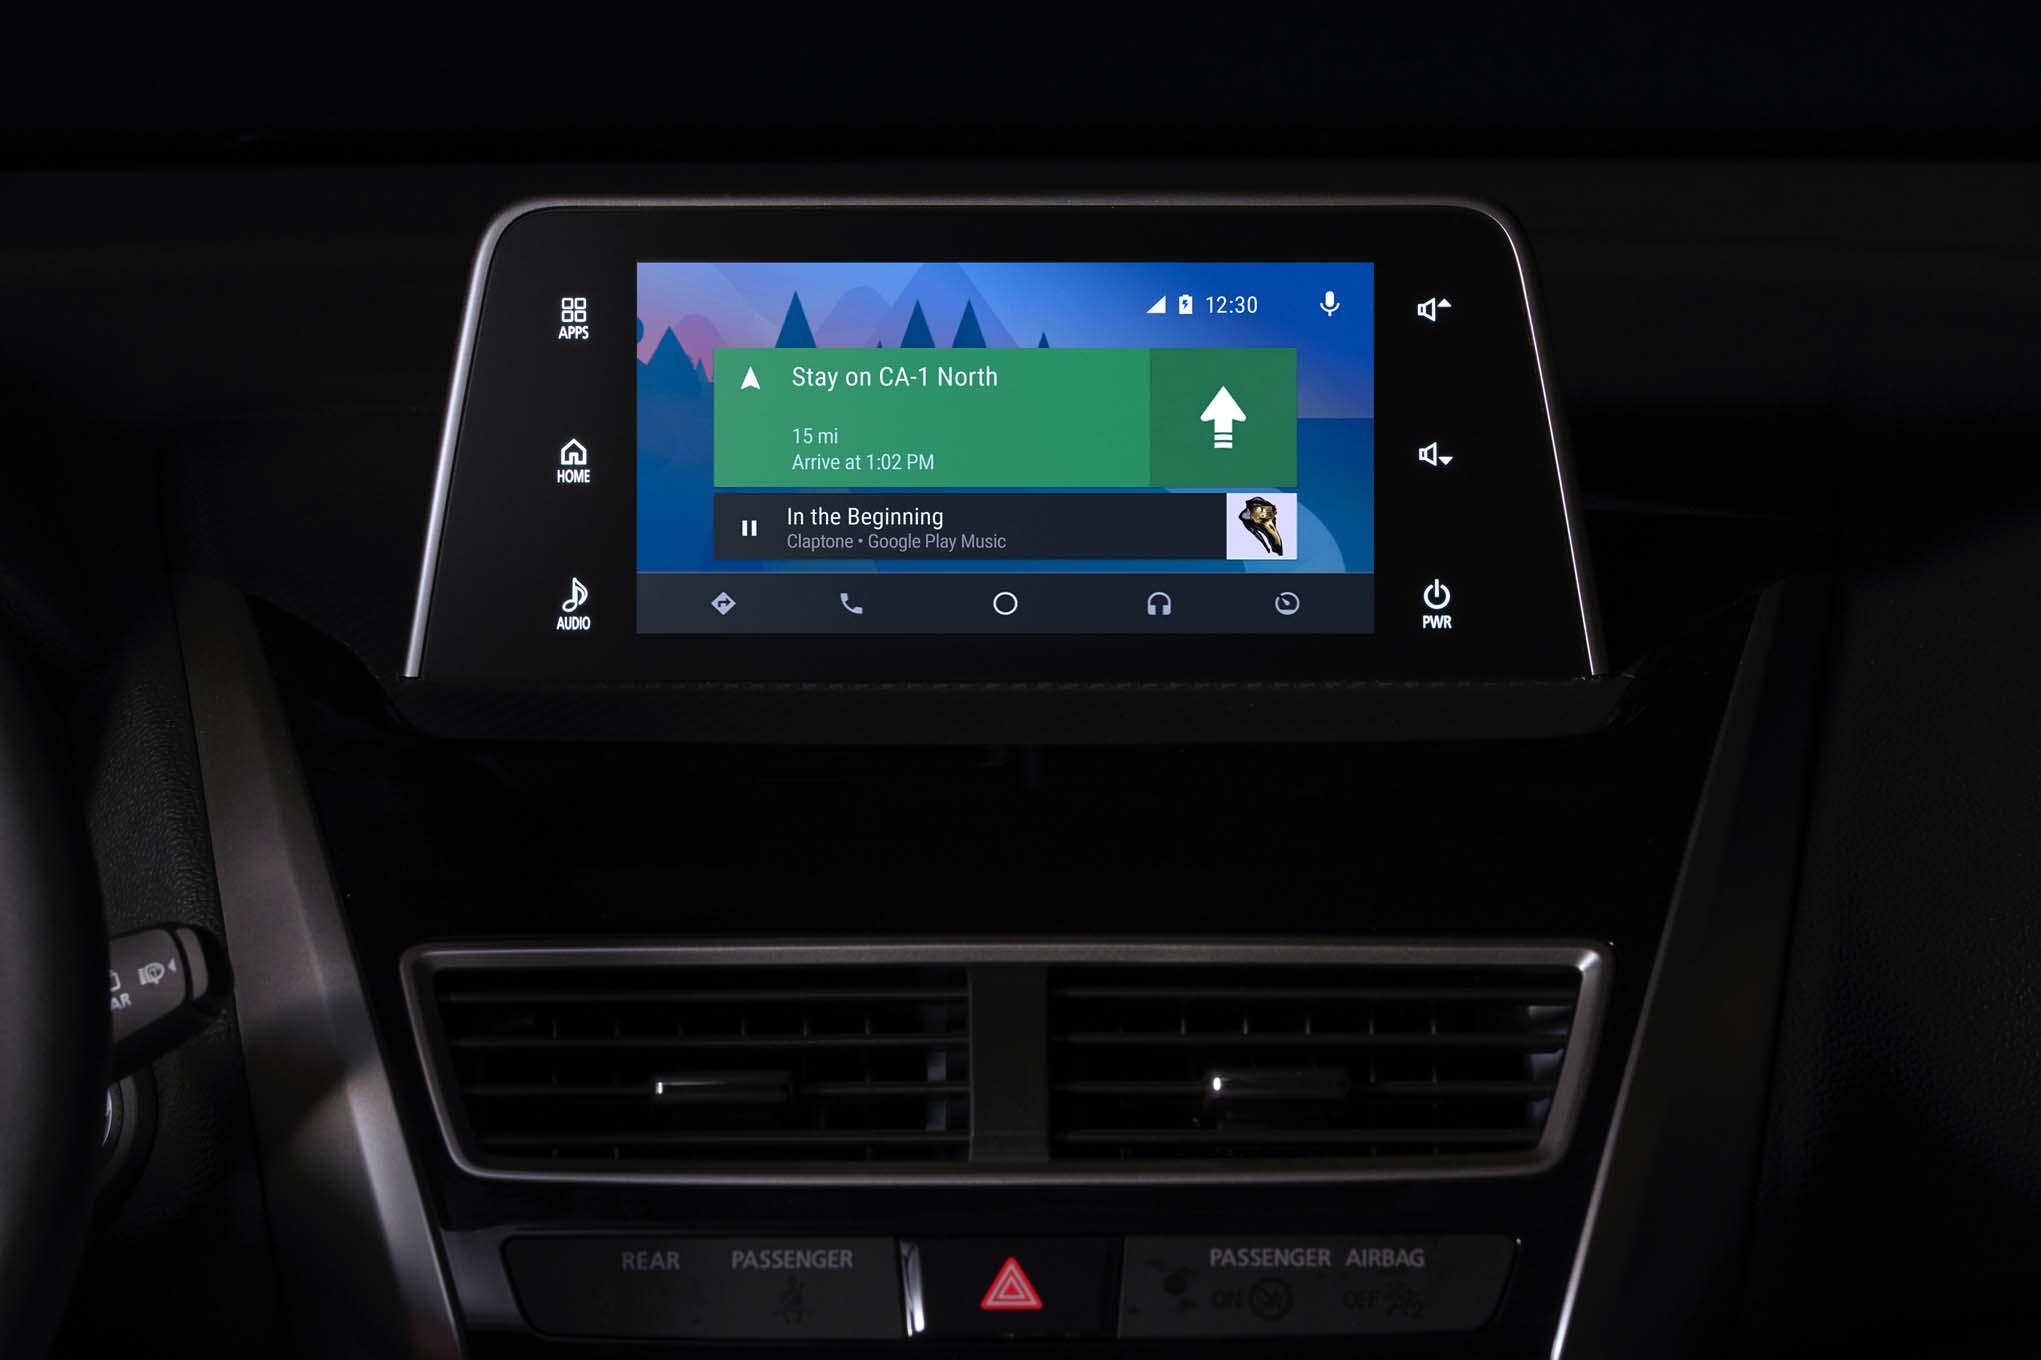 2018 Mitsubishi Eclipse Cross Navigations Screen 1